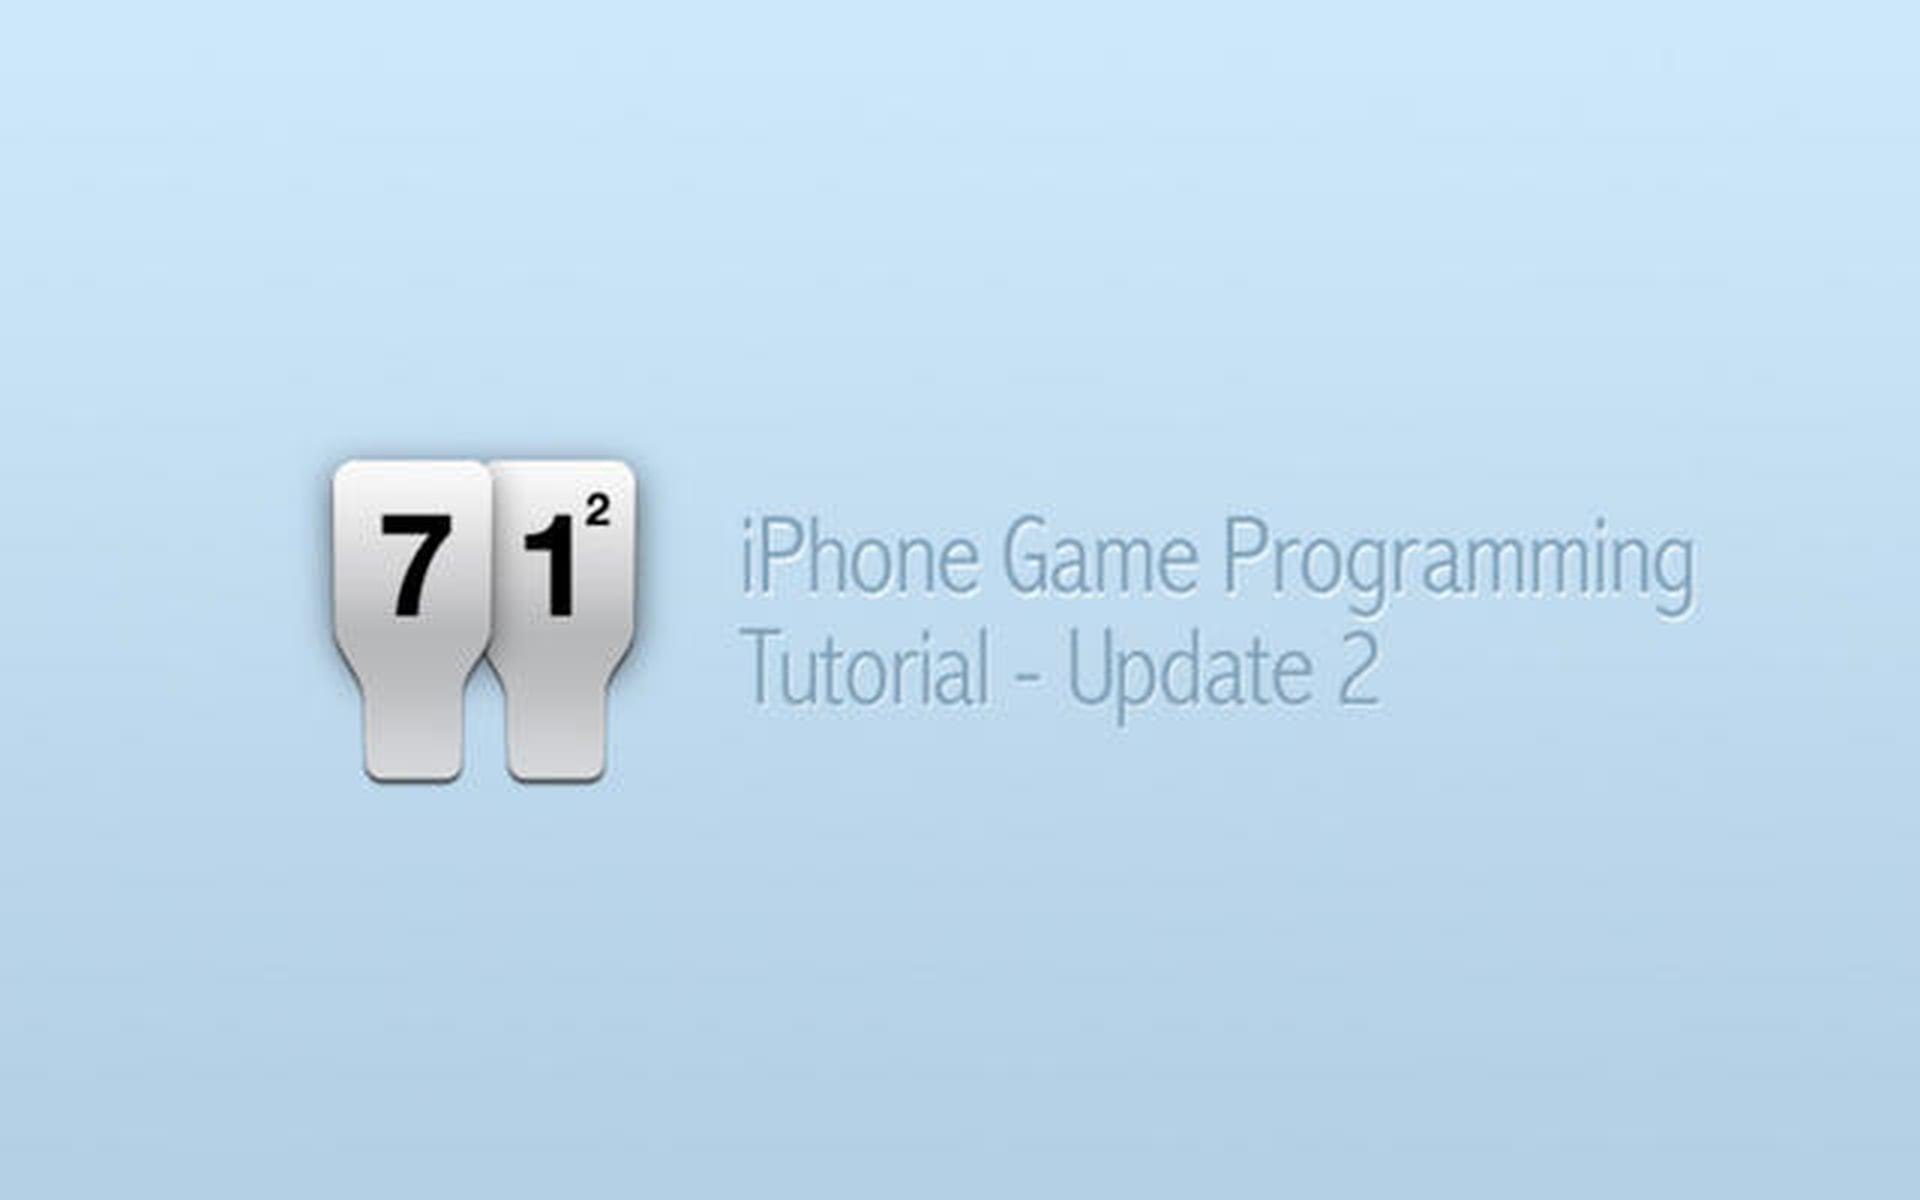 iPhone Game Programming – Tutorial Update 2